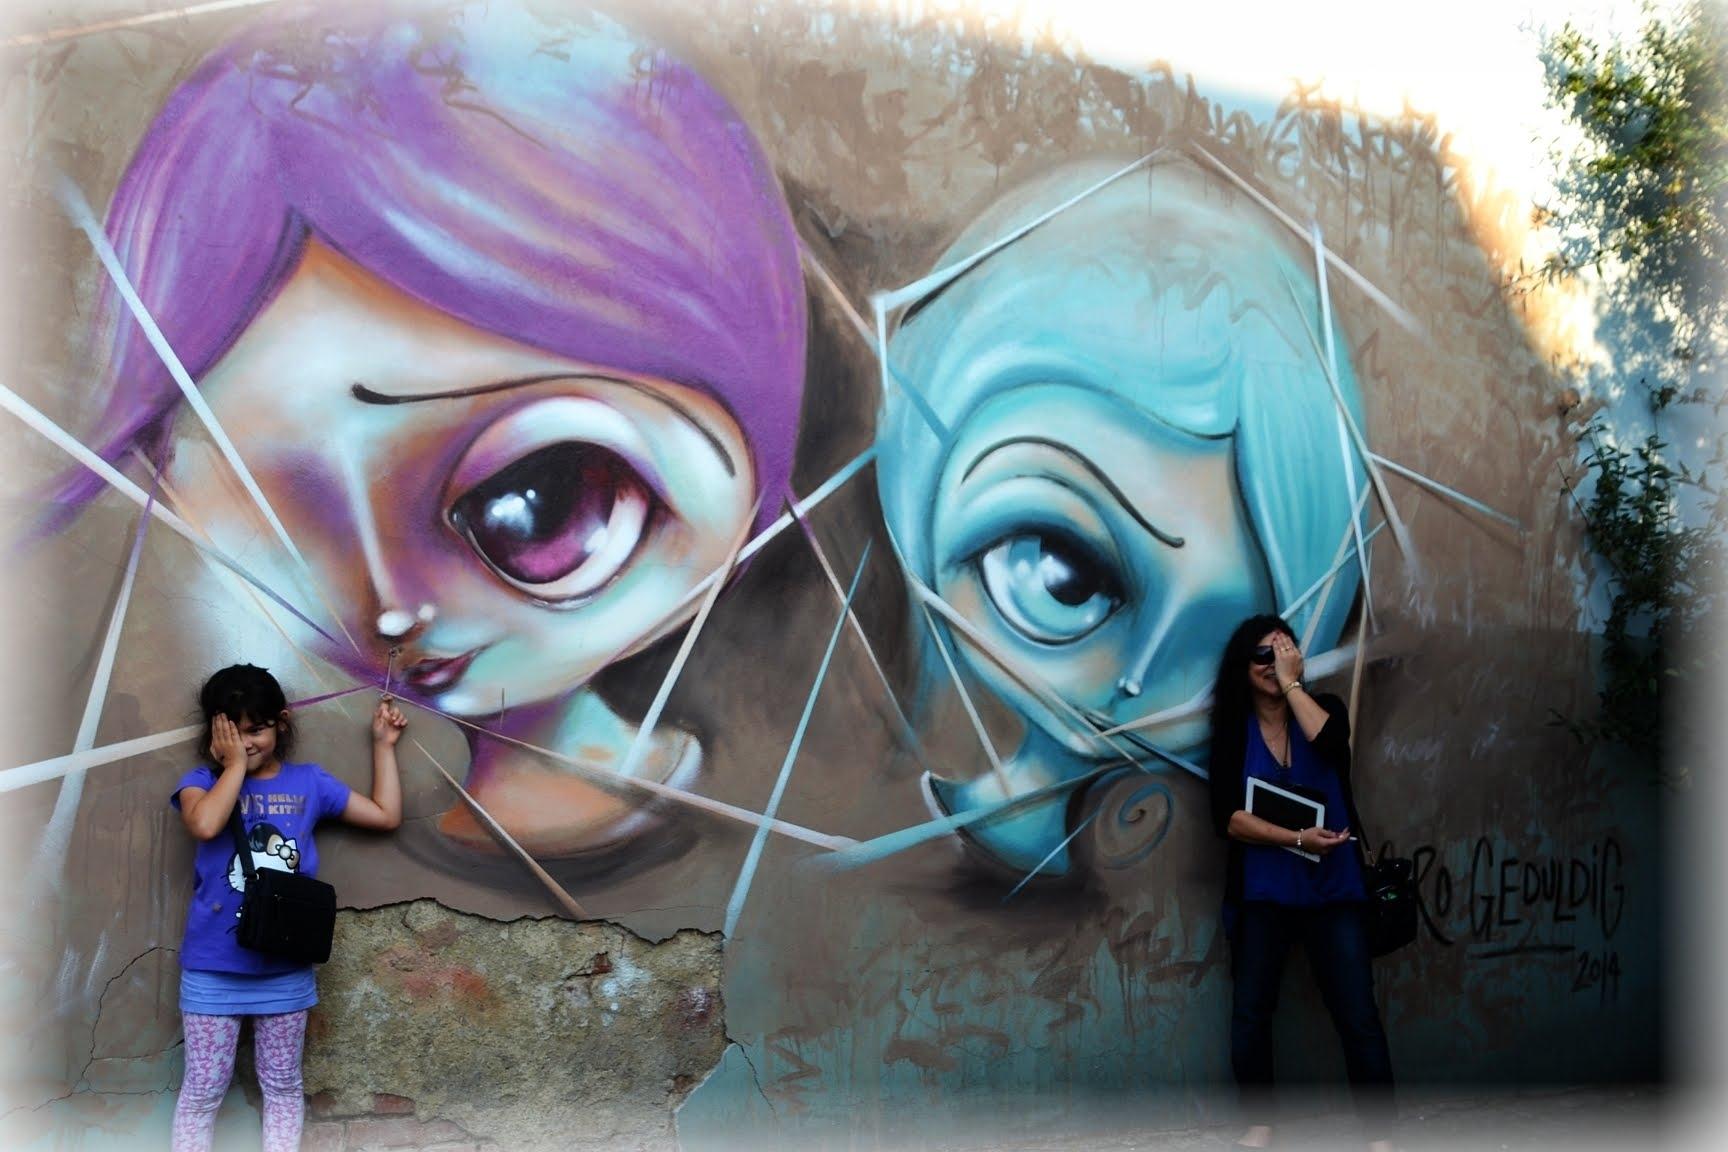 Ibug – Graffiti, Wall Art & Abstract Art – Youtube For Graffiti Wall Art (View 14 of 20)